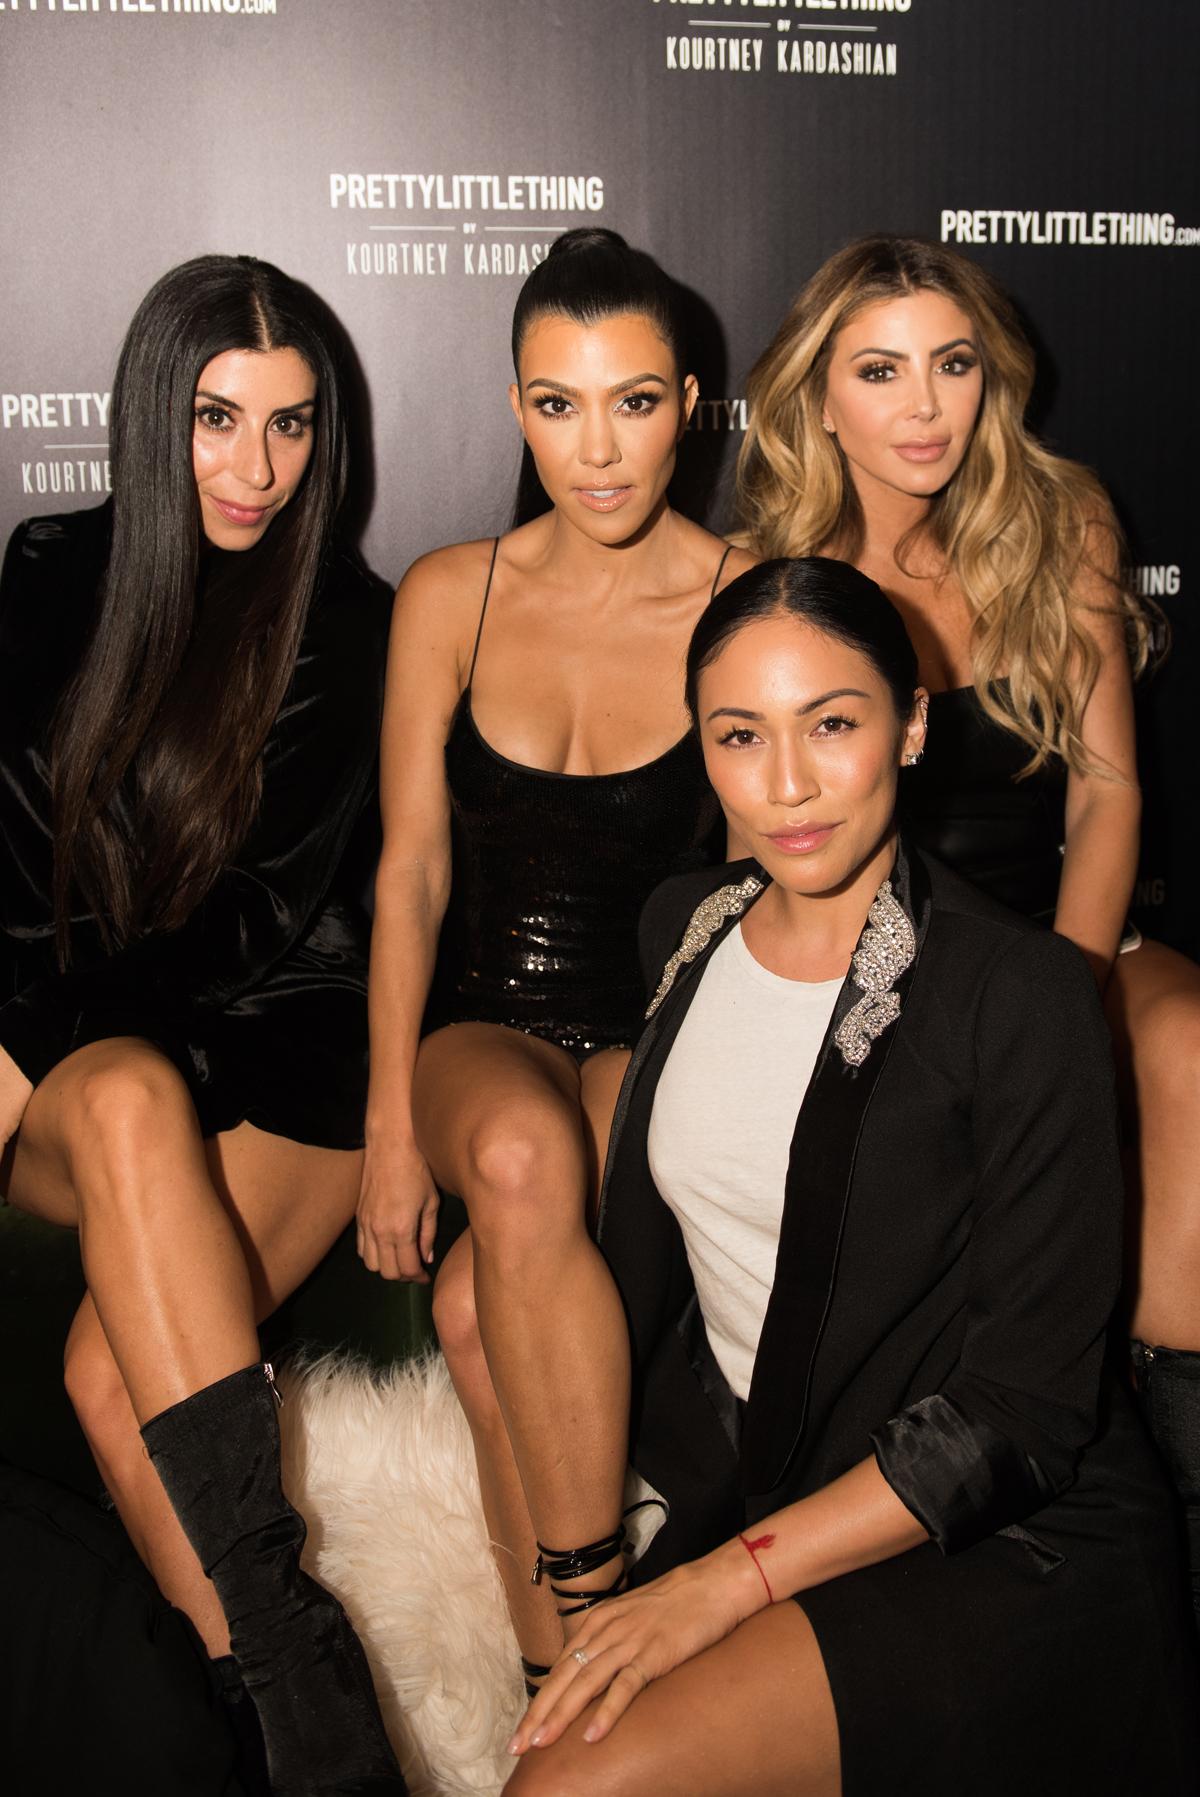 PrettyLittleThing PLT X Kourtney Kardashian Collection Celebrity Launch Party Kourt and her girls.jpg